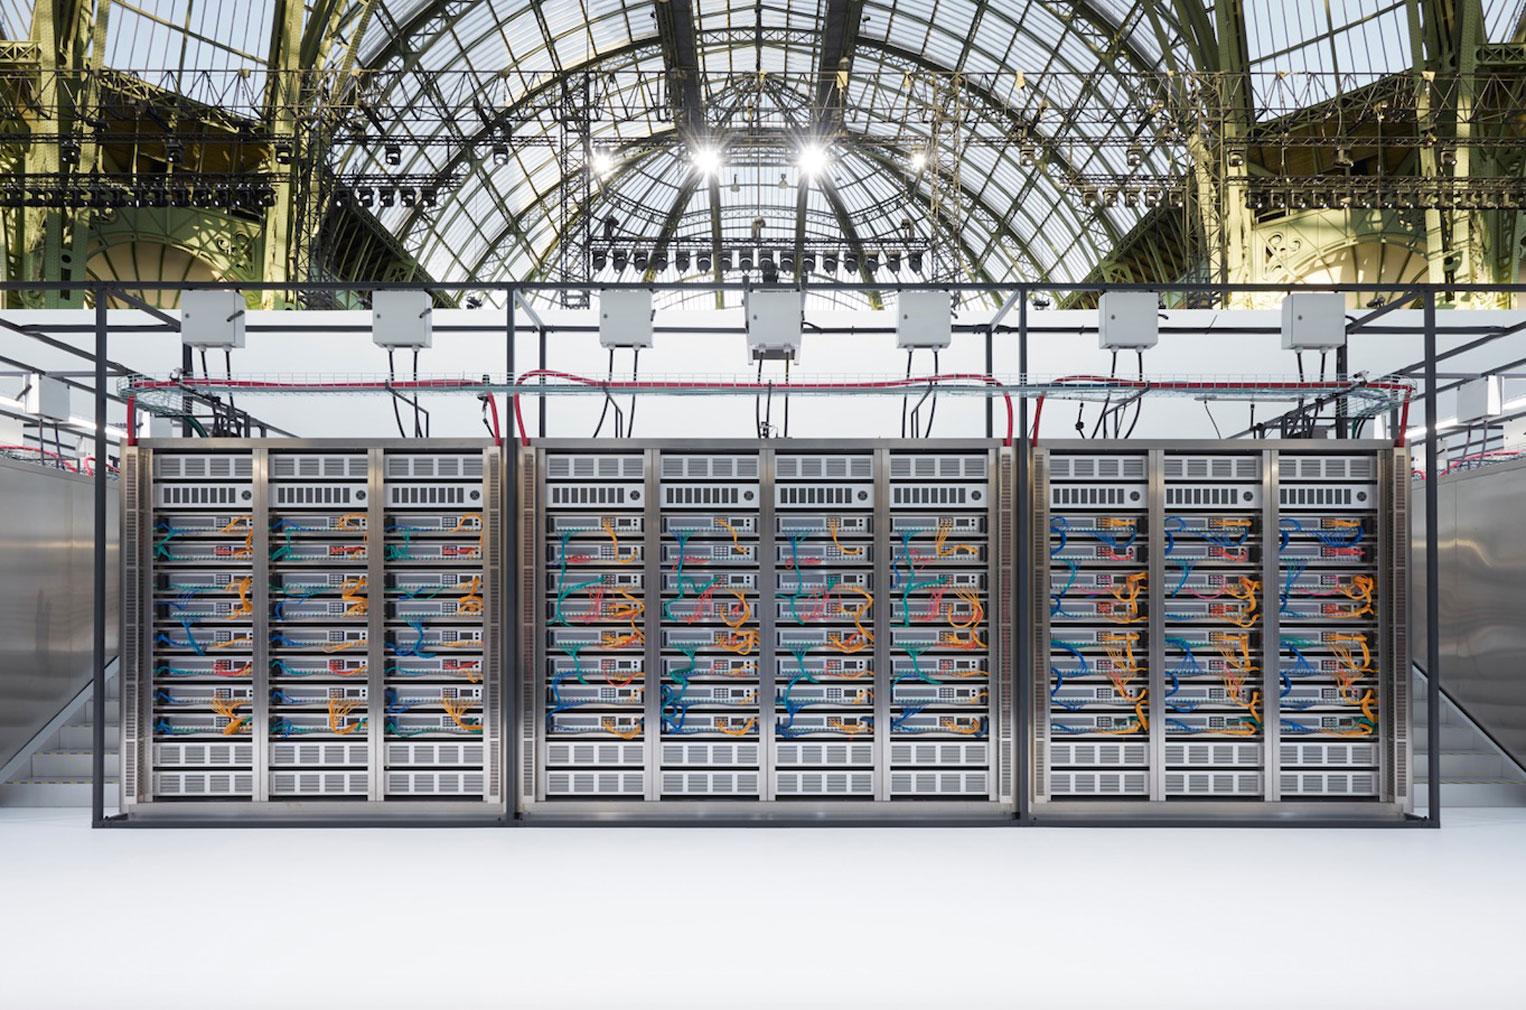 Data Centre Chanel - SS17 fashion show set